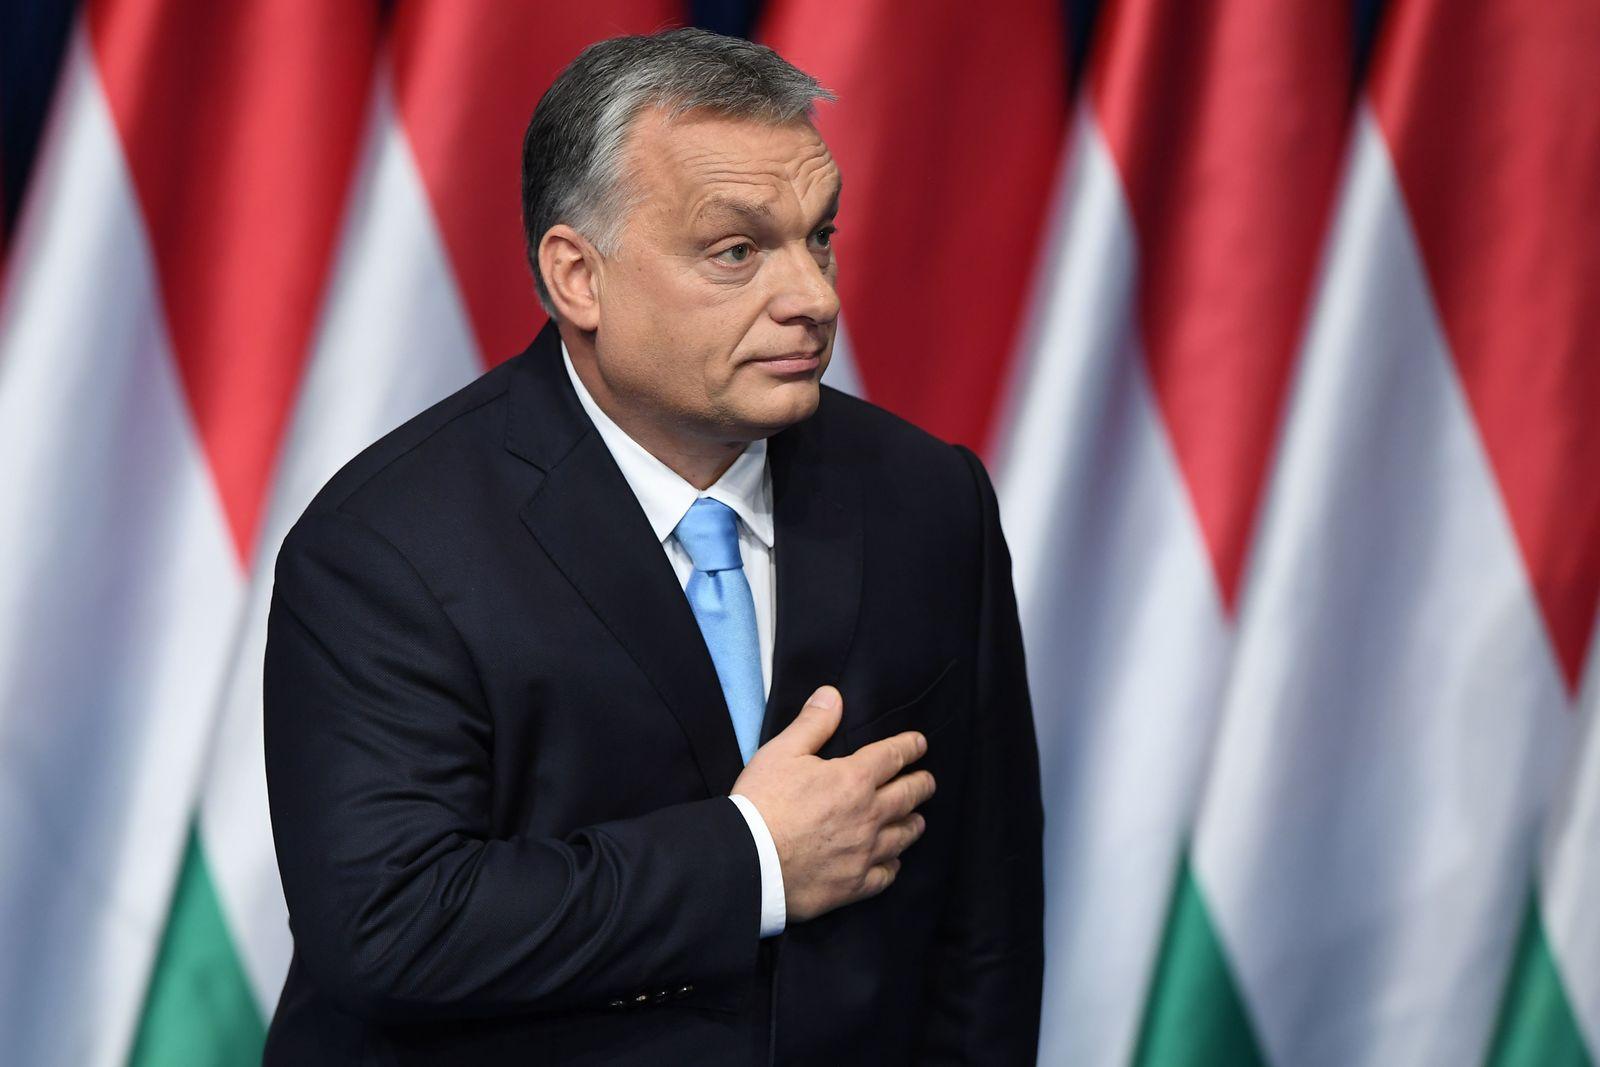 FILES-HUNGARY-POLITICS-EU-VOTE-ORBAN